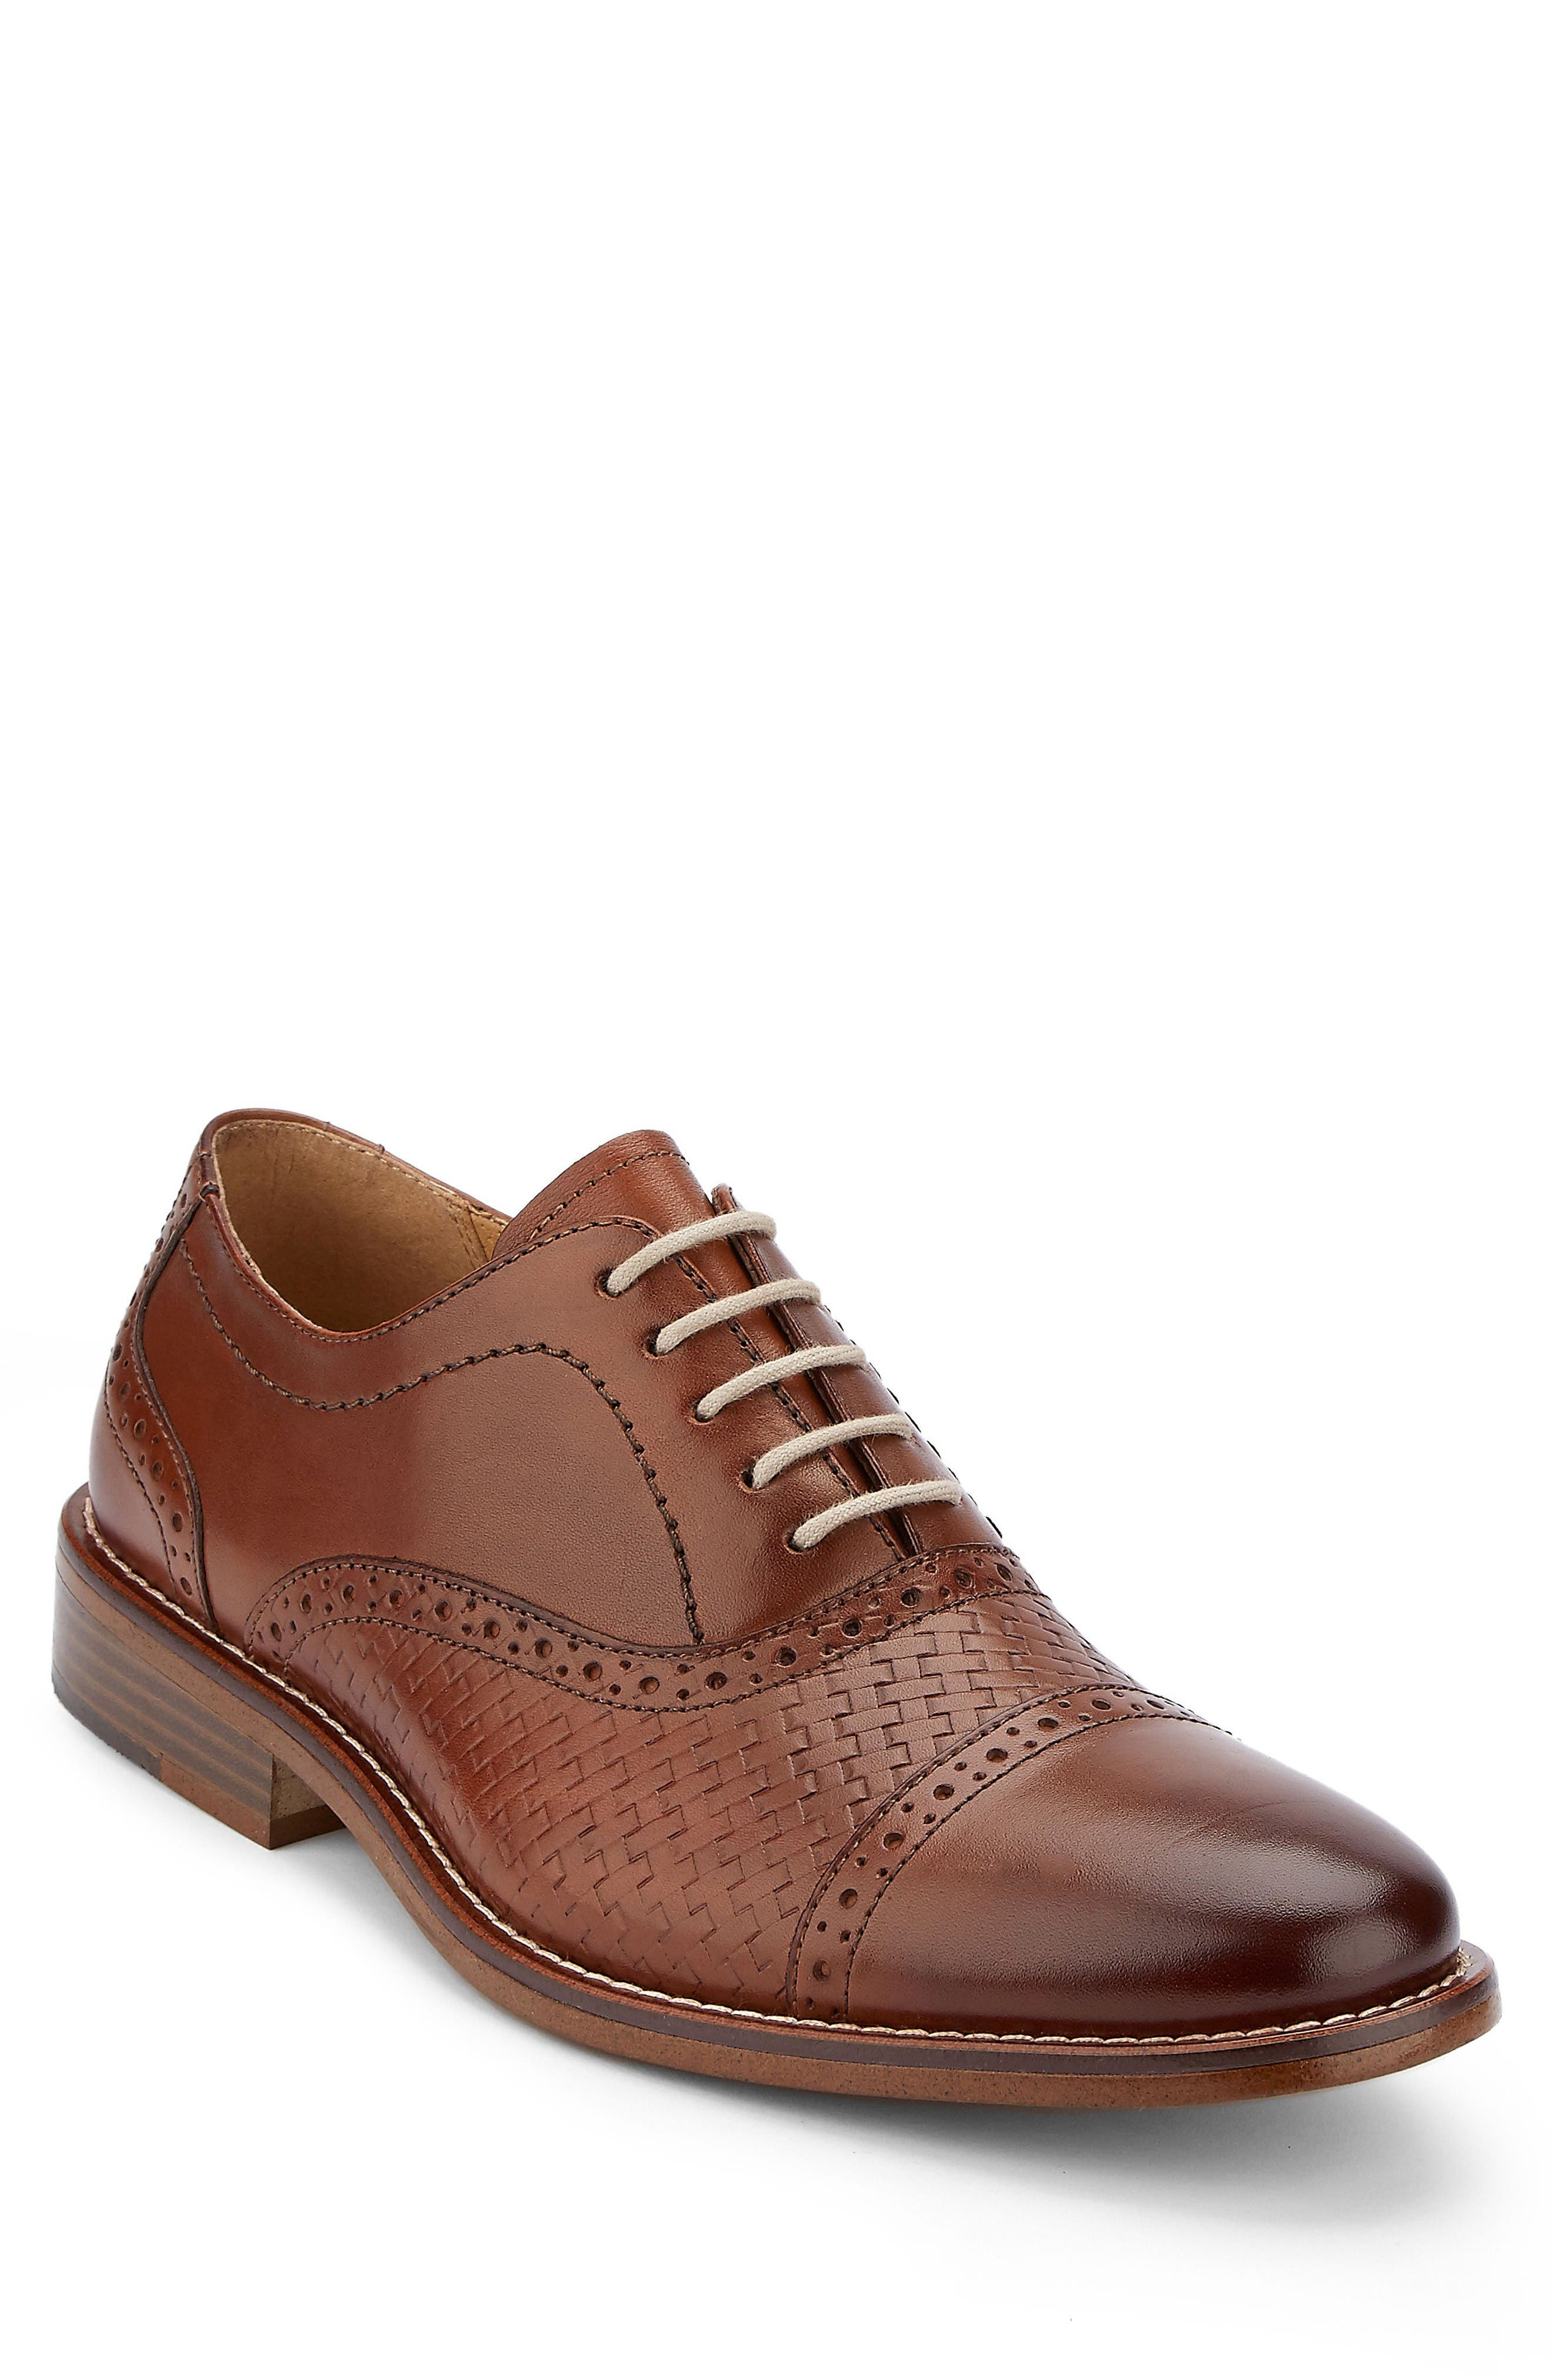 G.H. Bass & Co. Cole Cap Toe Oxford (Men)